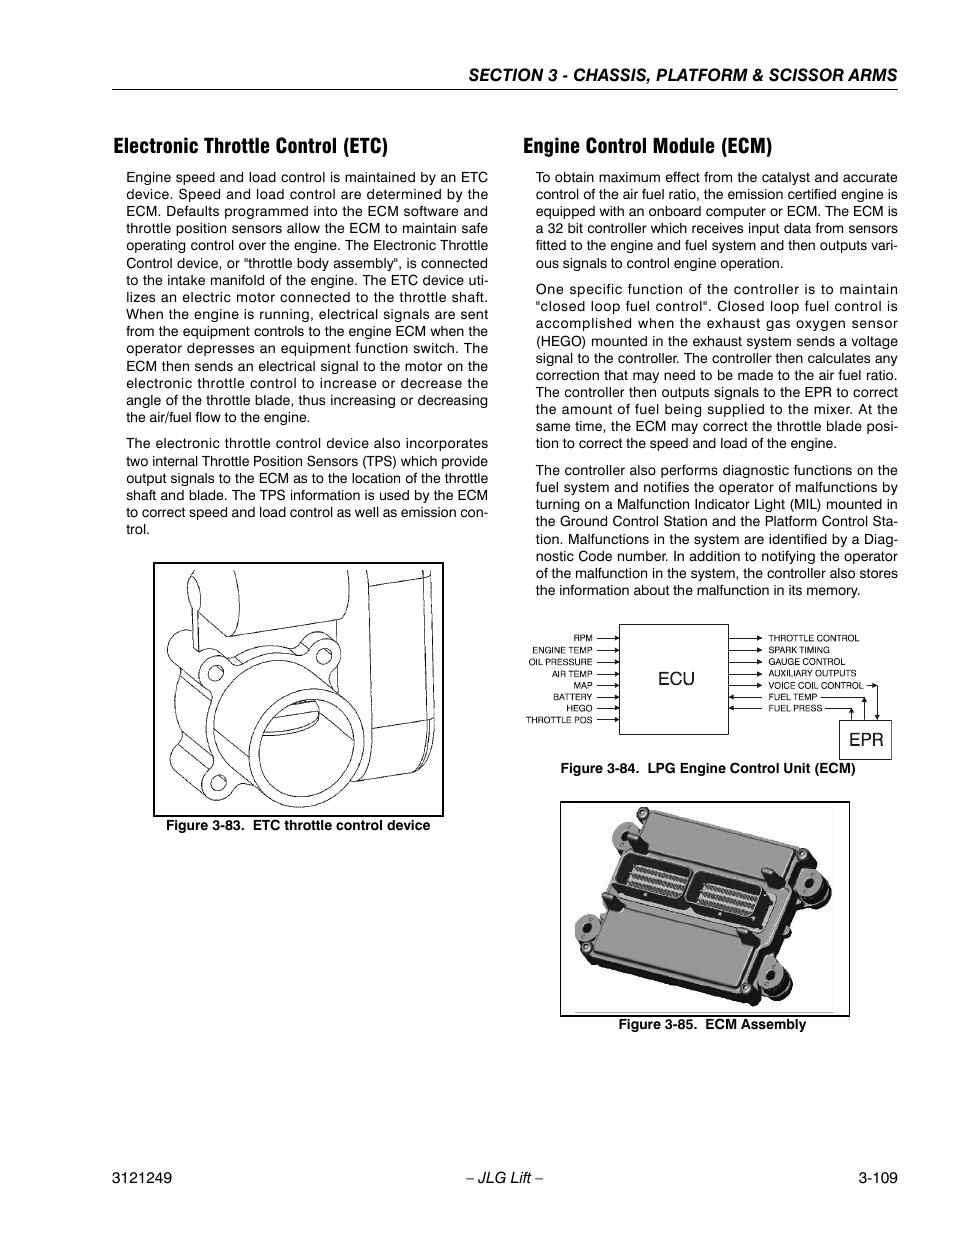 Electronic throttle control (etc), Engine control module (ecm), Etc throttle